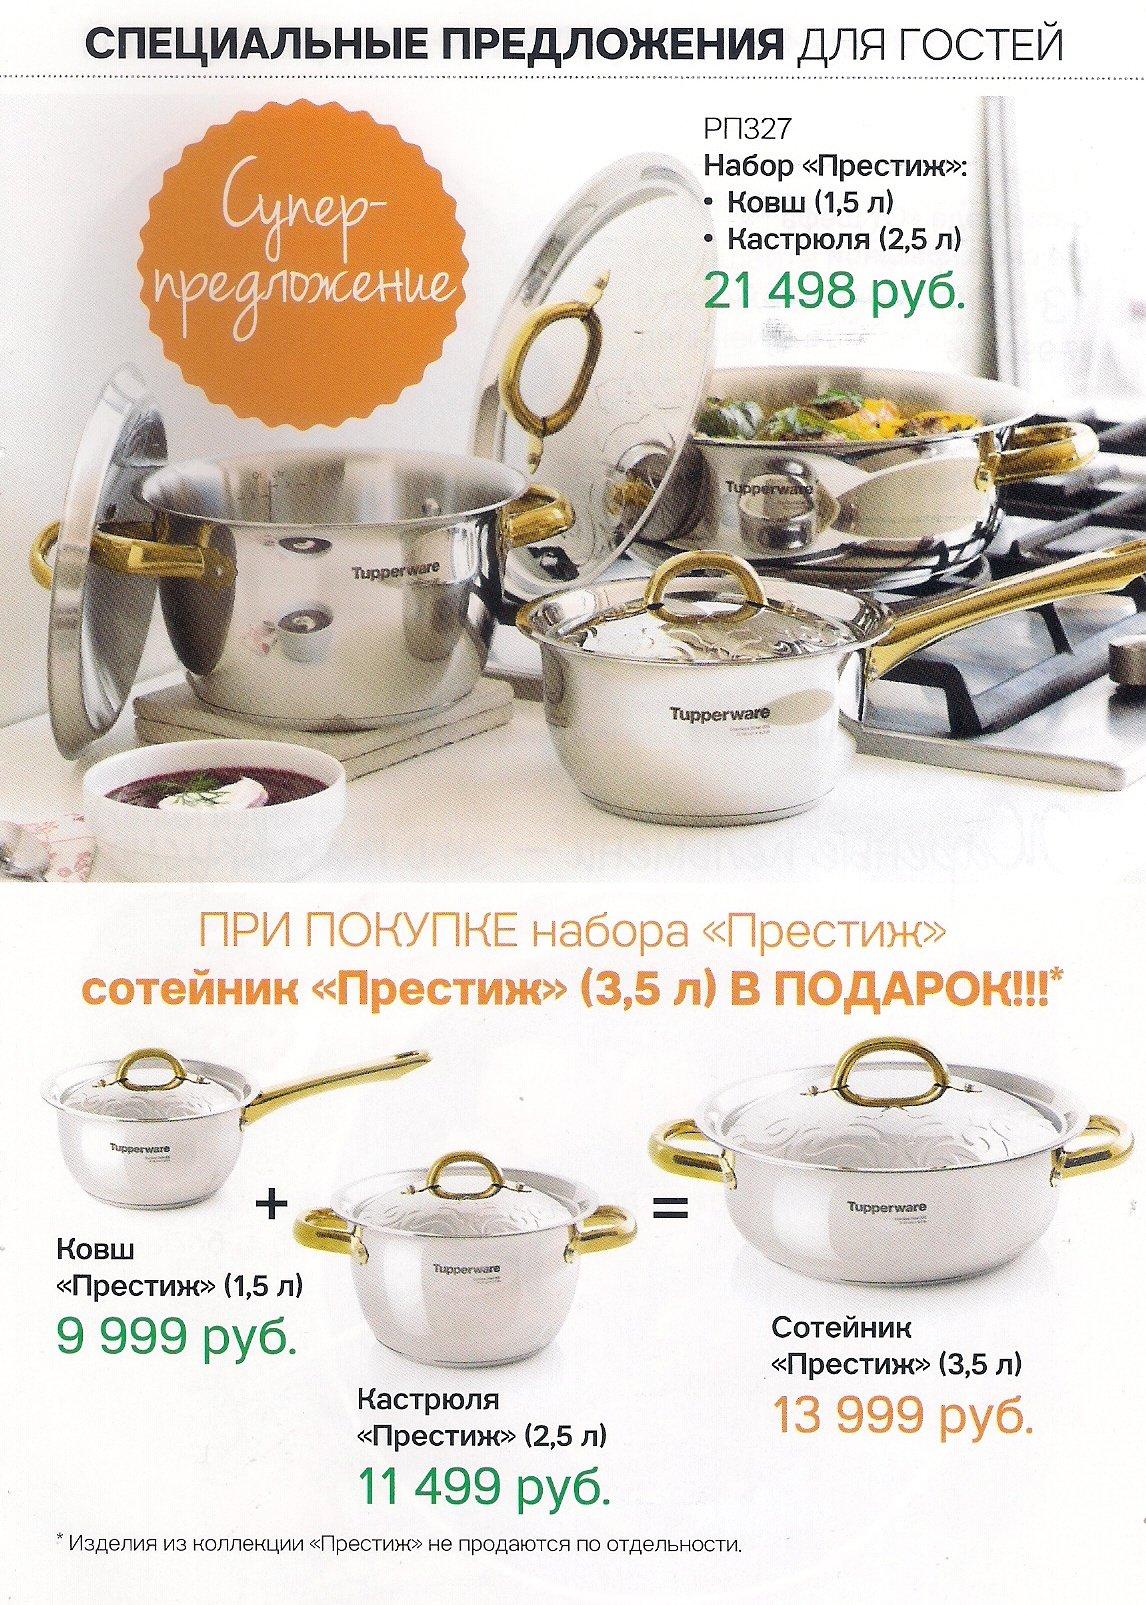 https://tupperware-online.ru/images/upload/20d.jpg